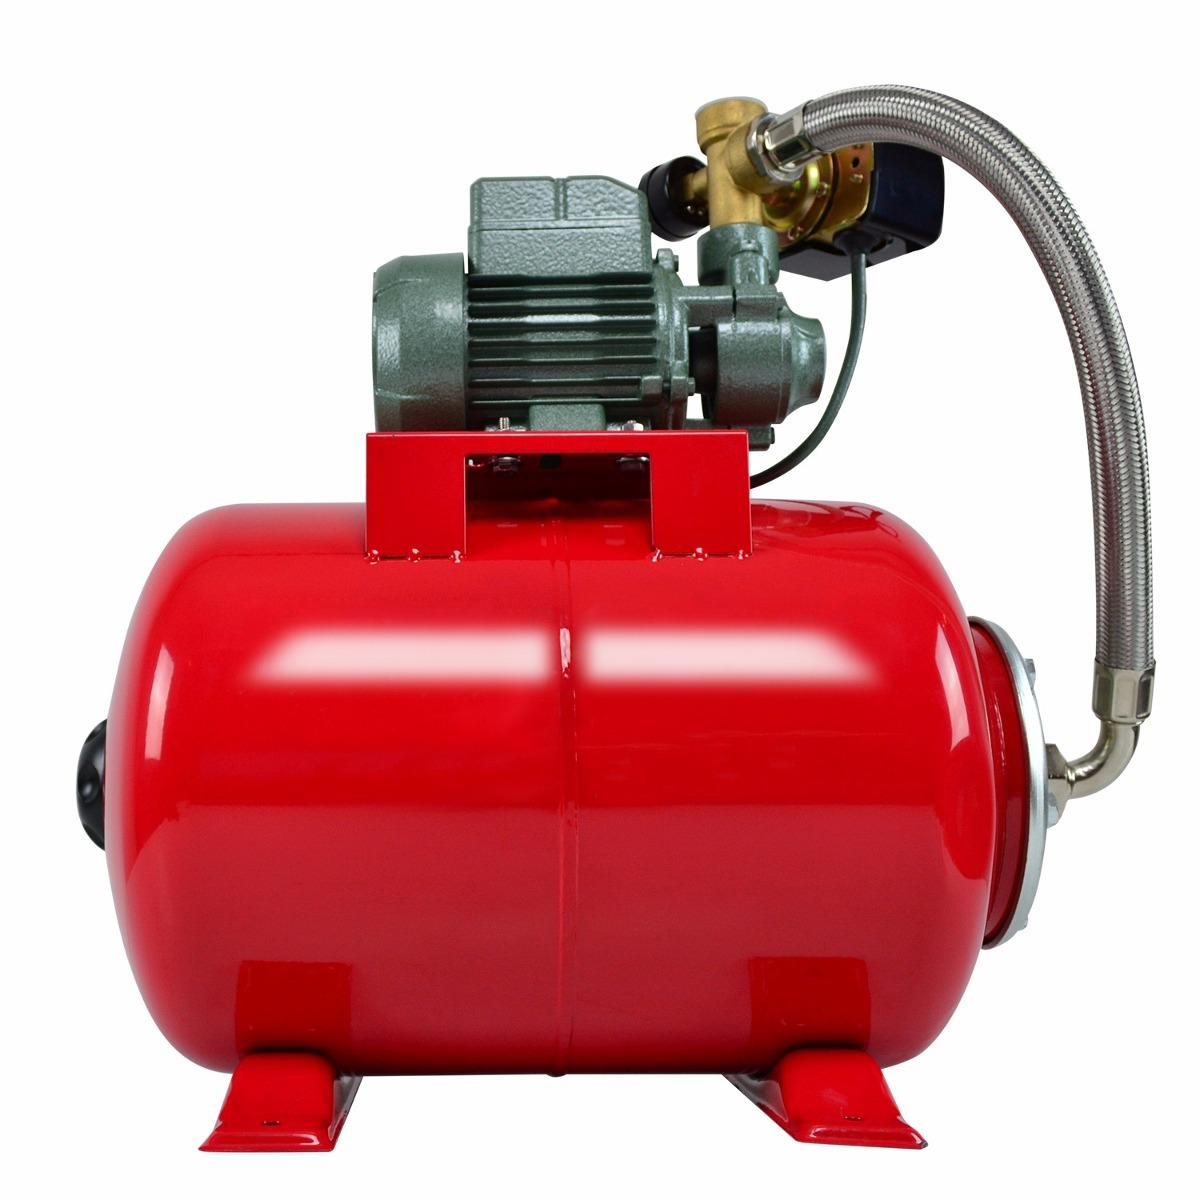 hidroneumatico shimge bonasa 1 2 hp horizontal 24lts